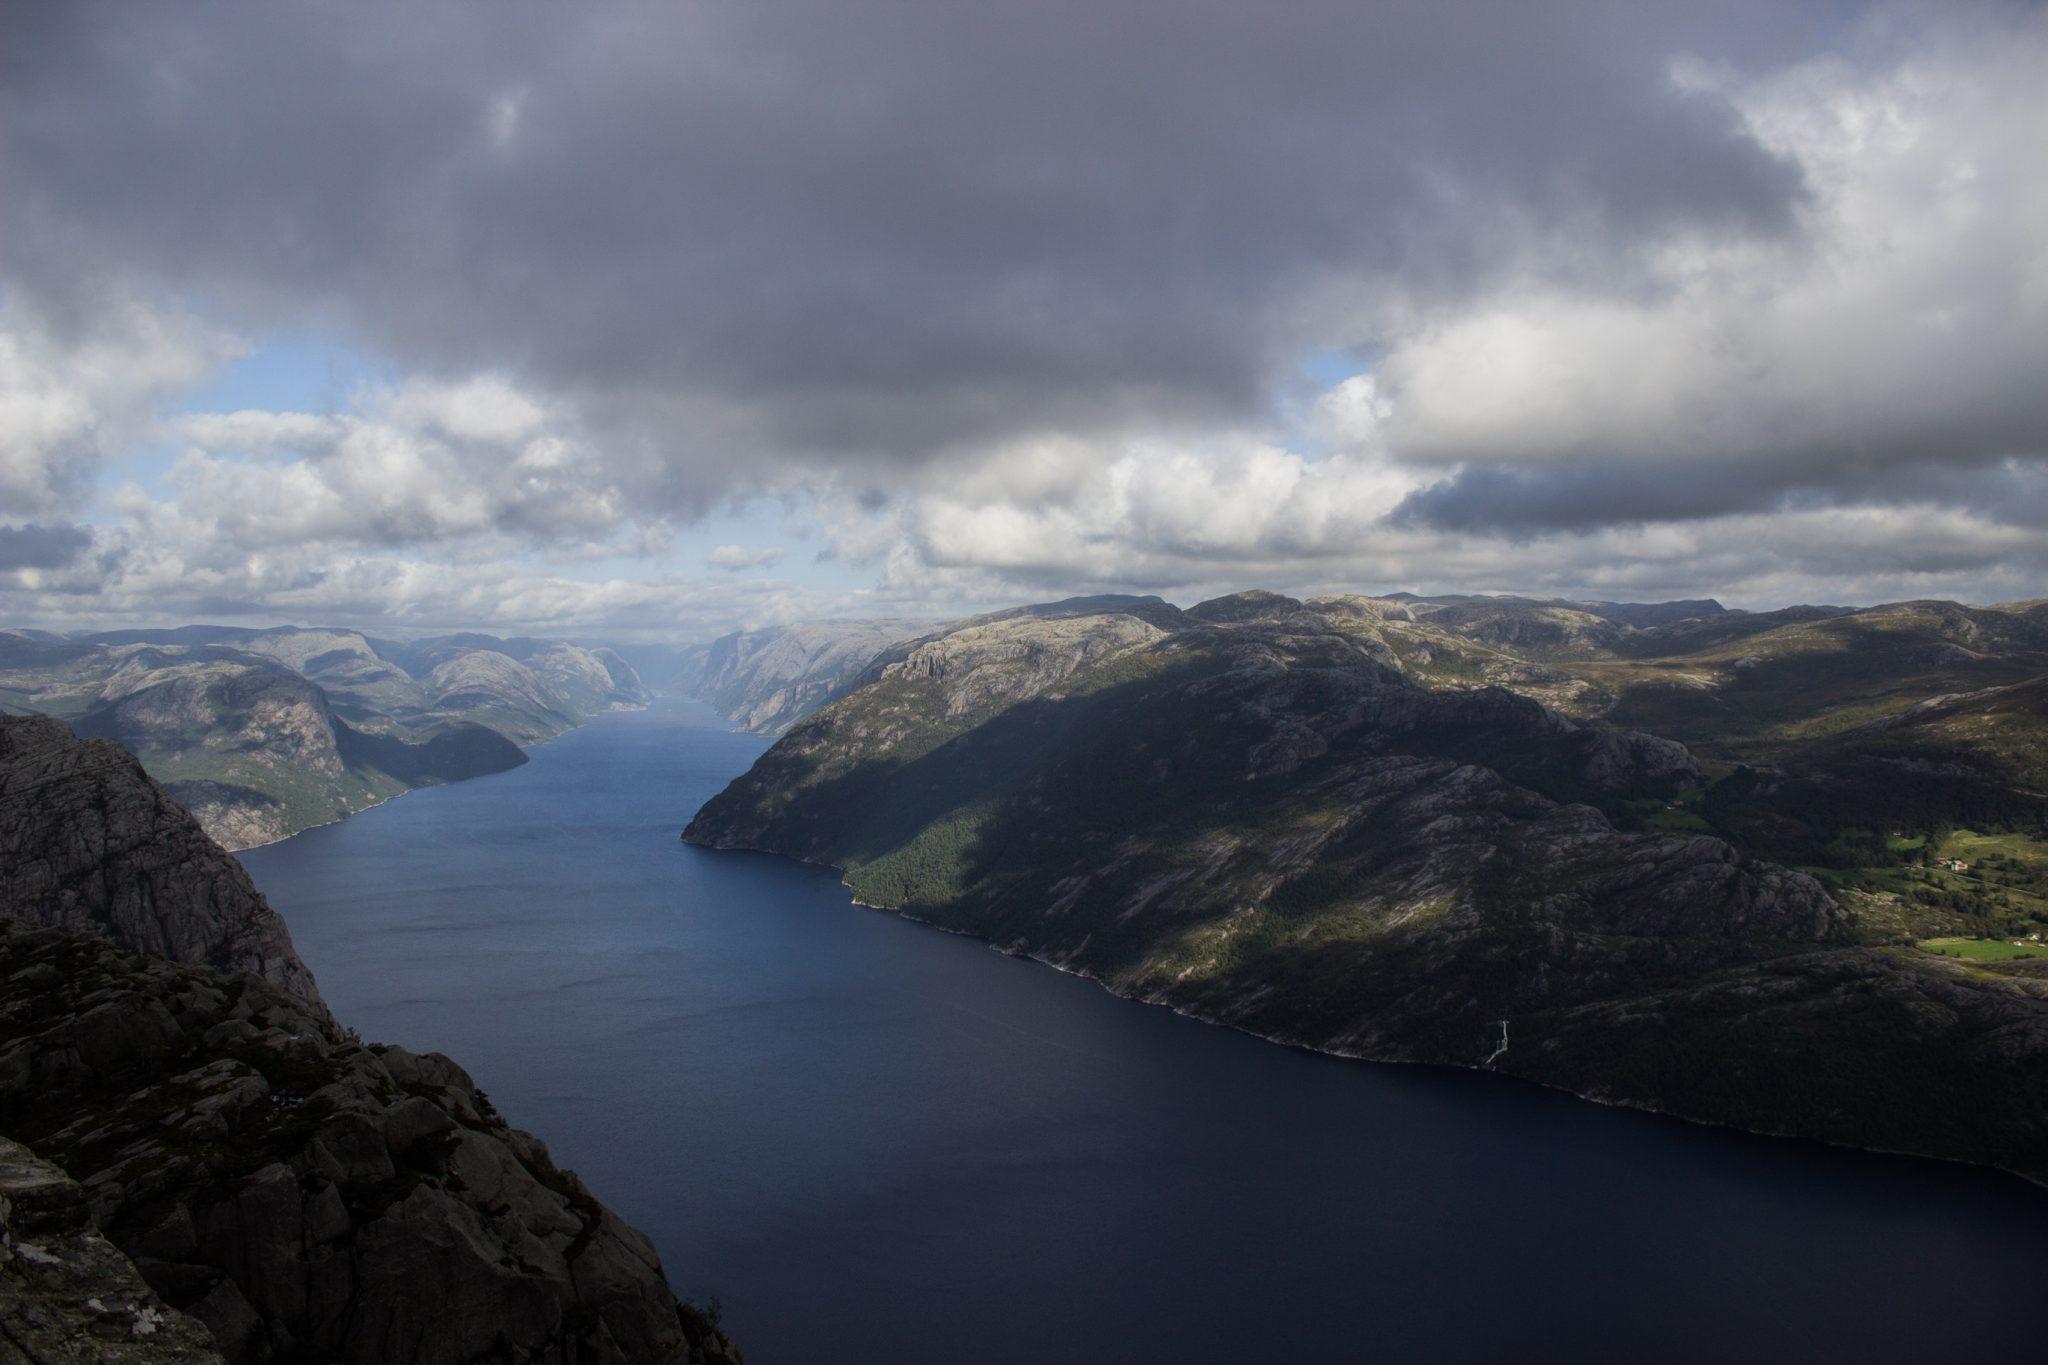 Wanderung zum Pulpit Rock Preikestolen, berühmtester Felsen in Norwegen, Blick auf Lysefjord